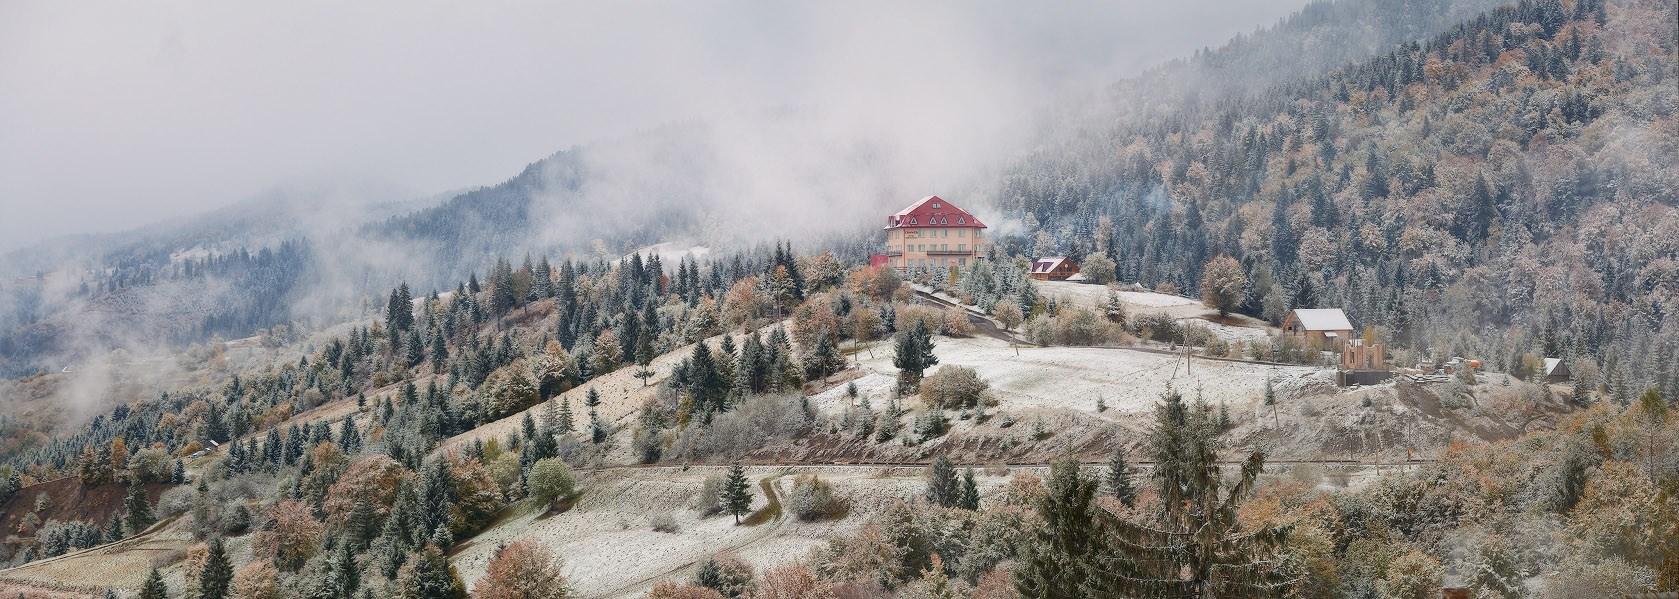 Снежный октябрь1